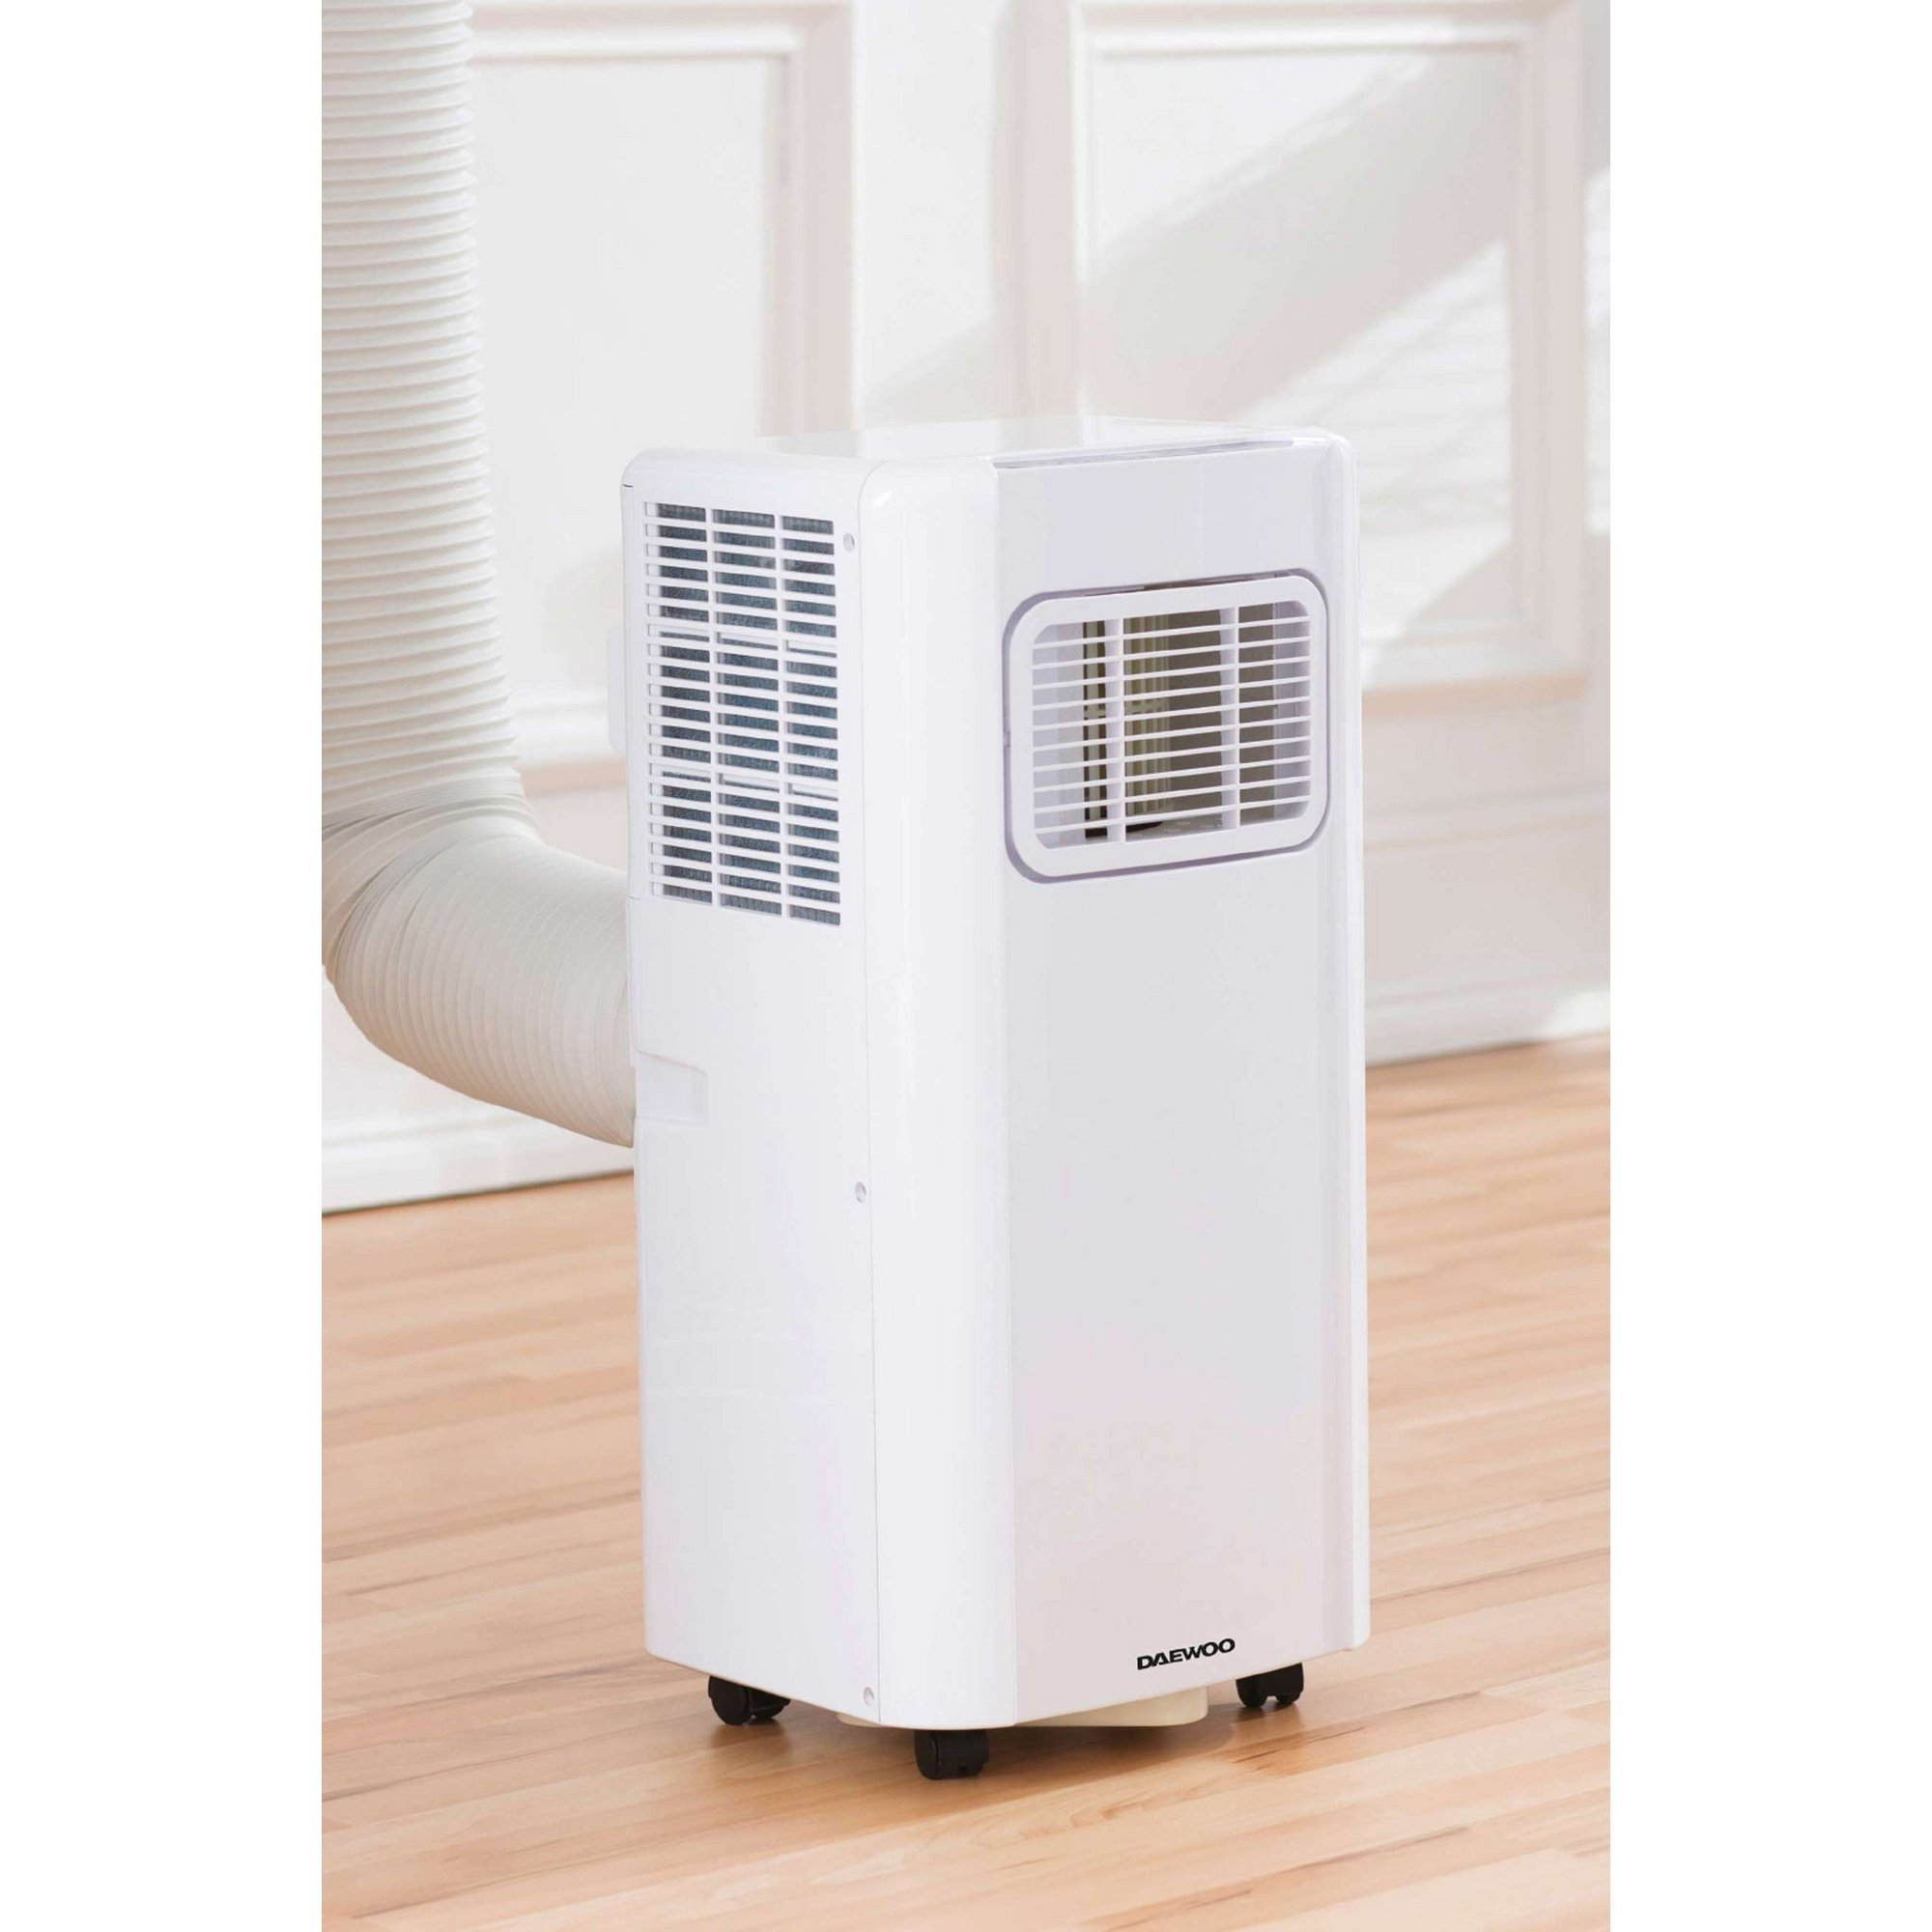 Image of Daewoo 9000 BTU Portable Air Conditioning Unit